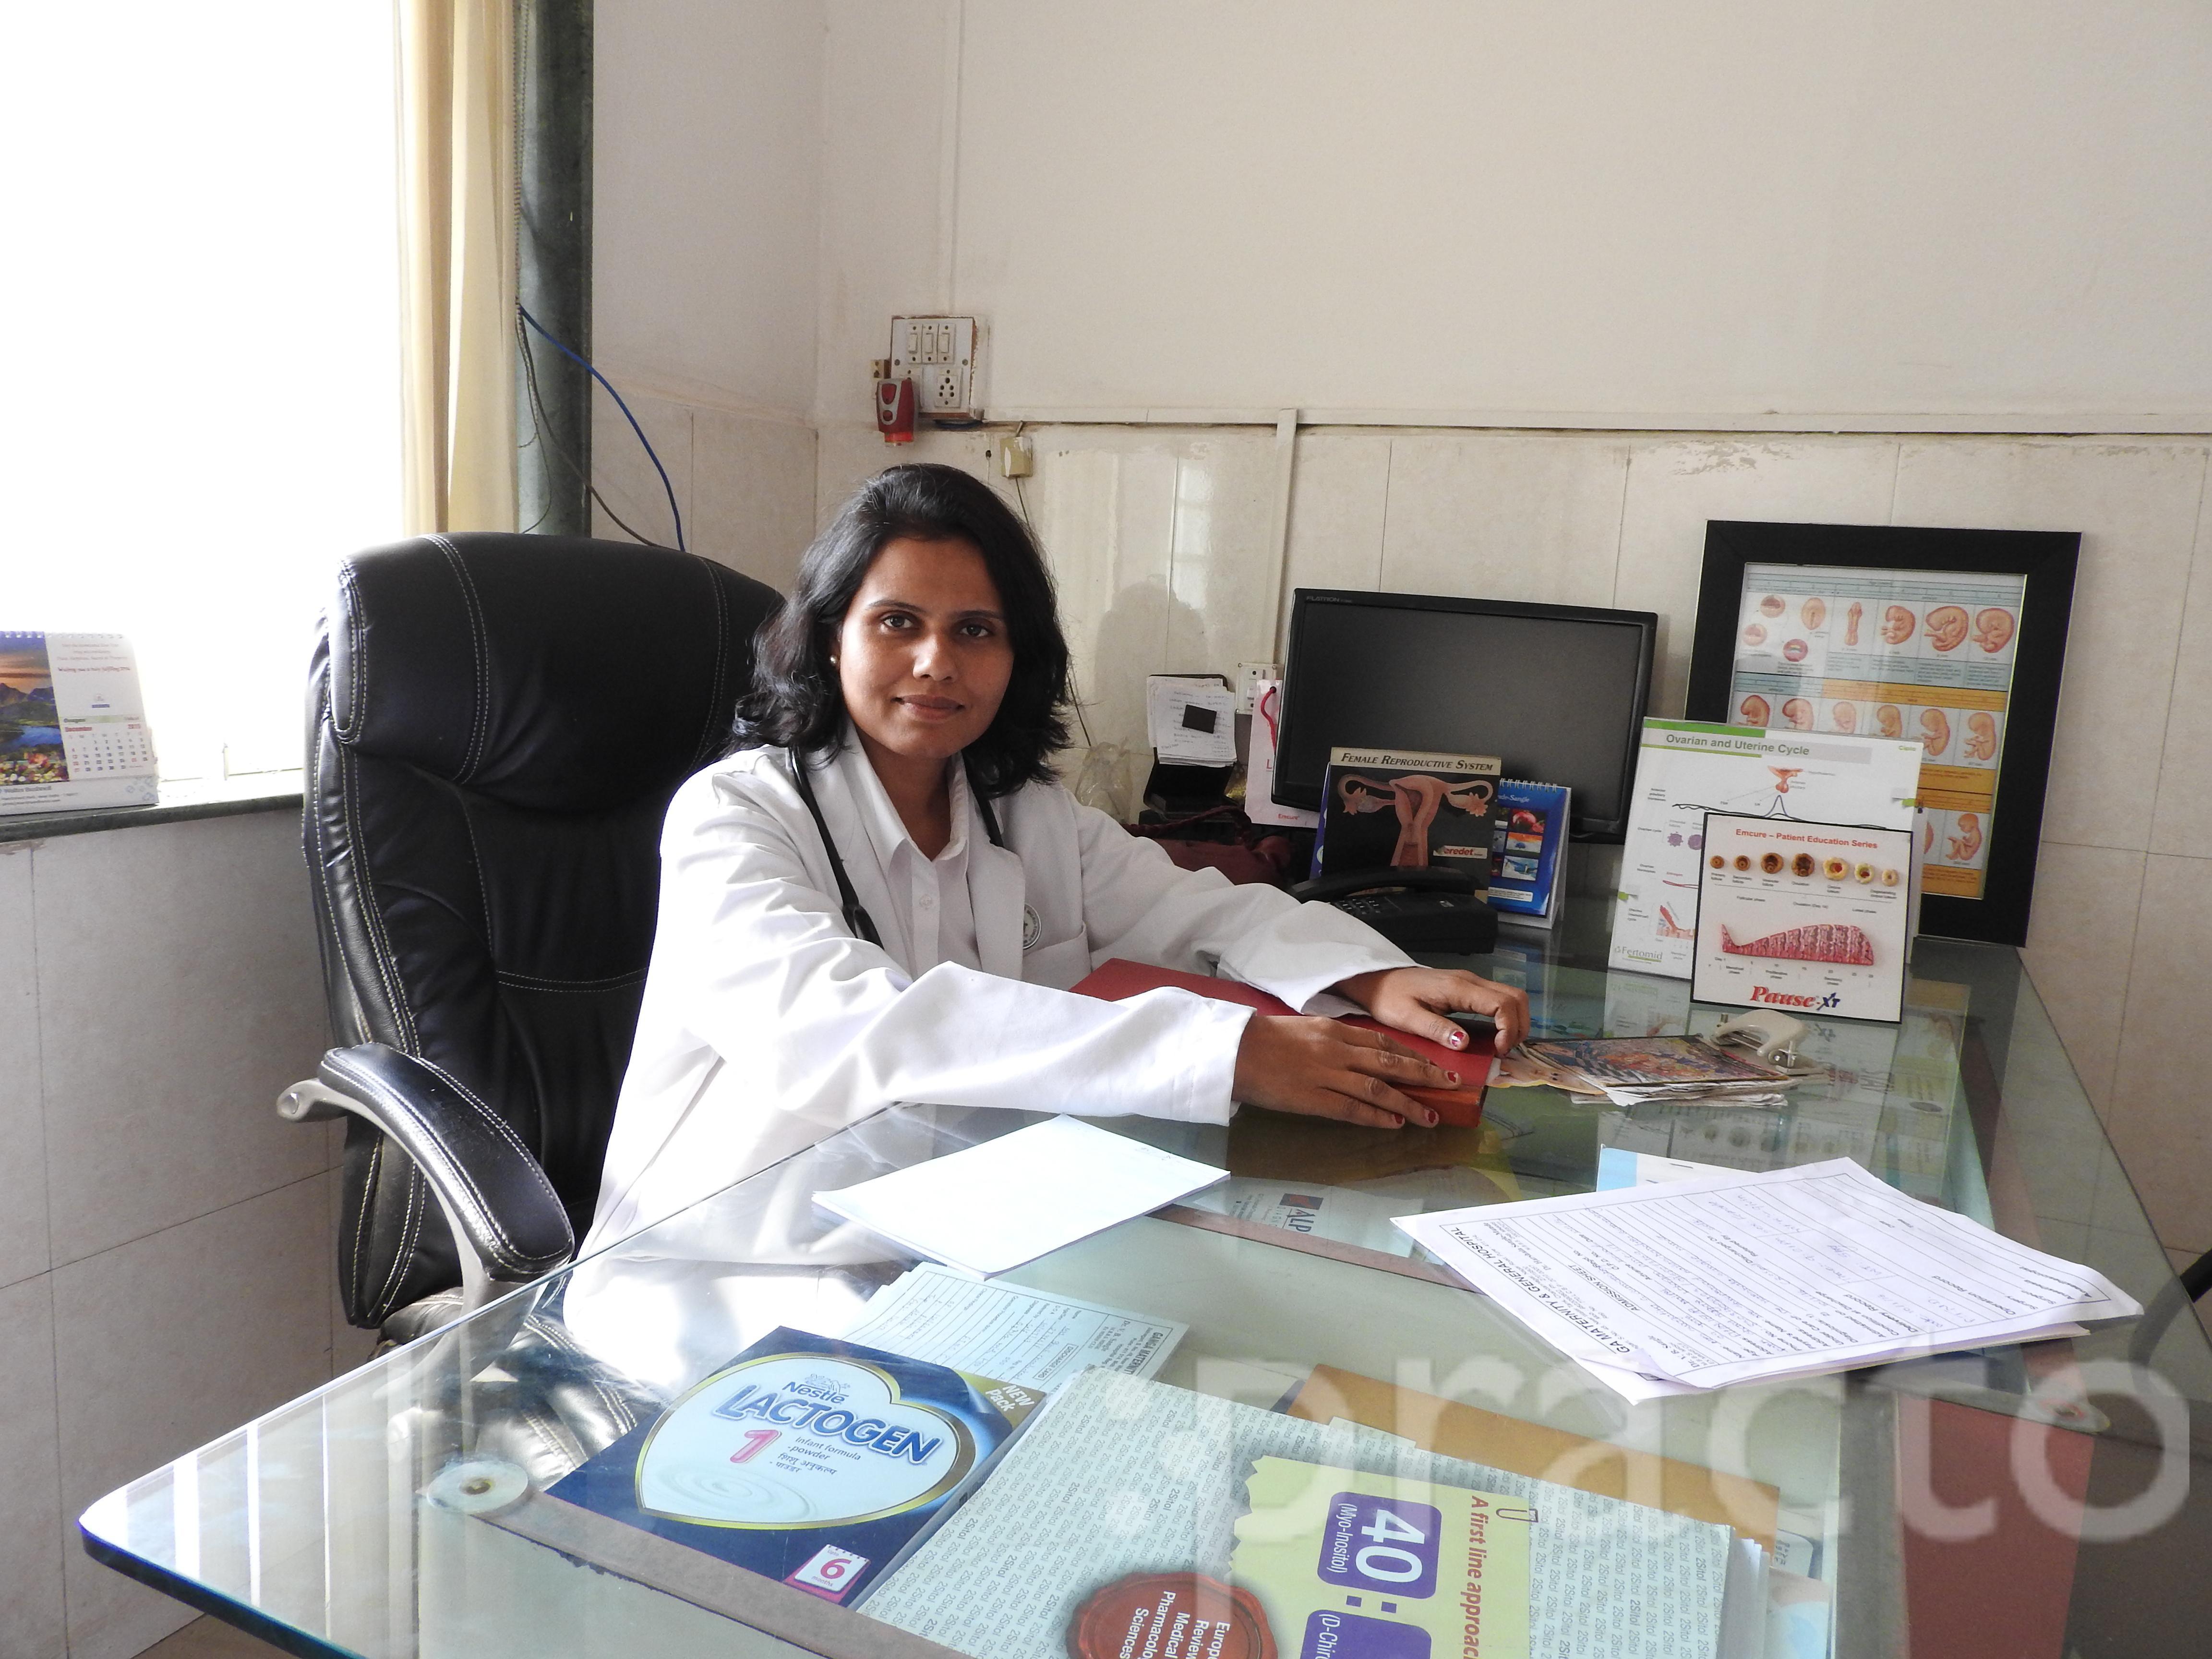 Dr. Harshala Sangale Munde - Gynecologist/Obstetrician